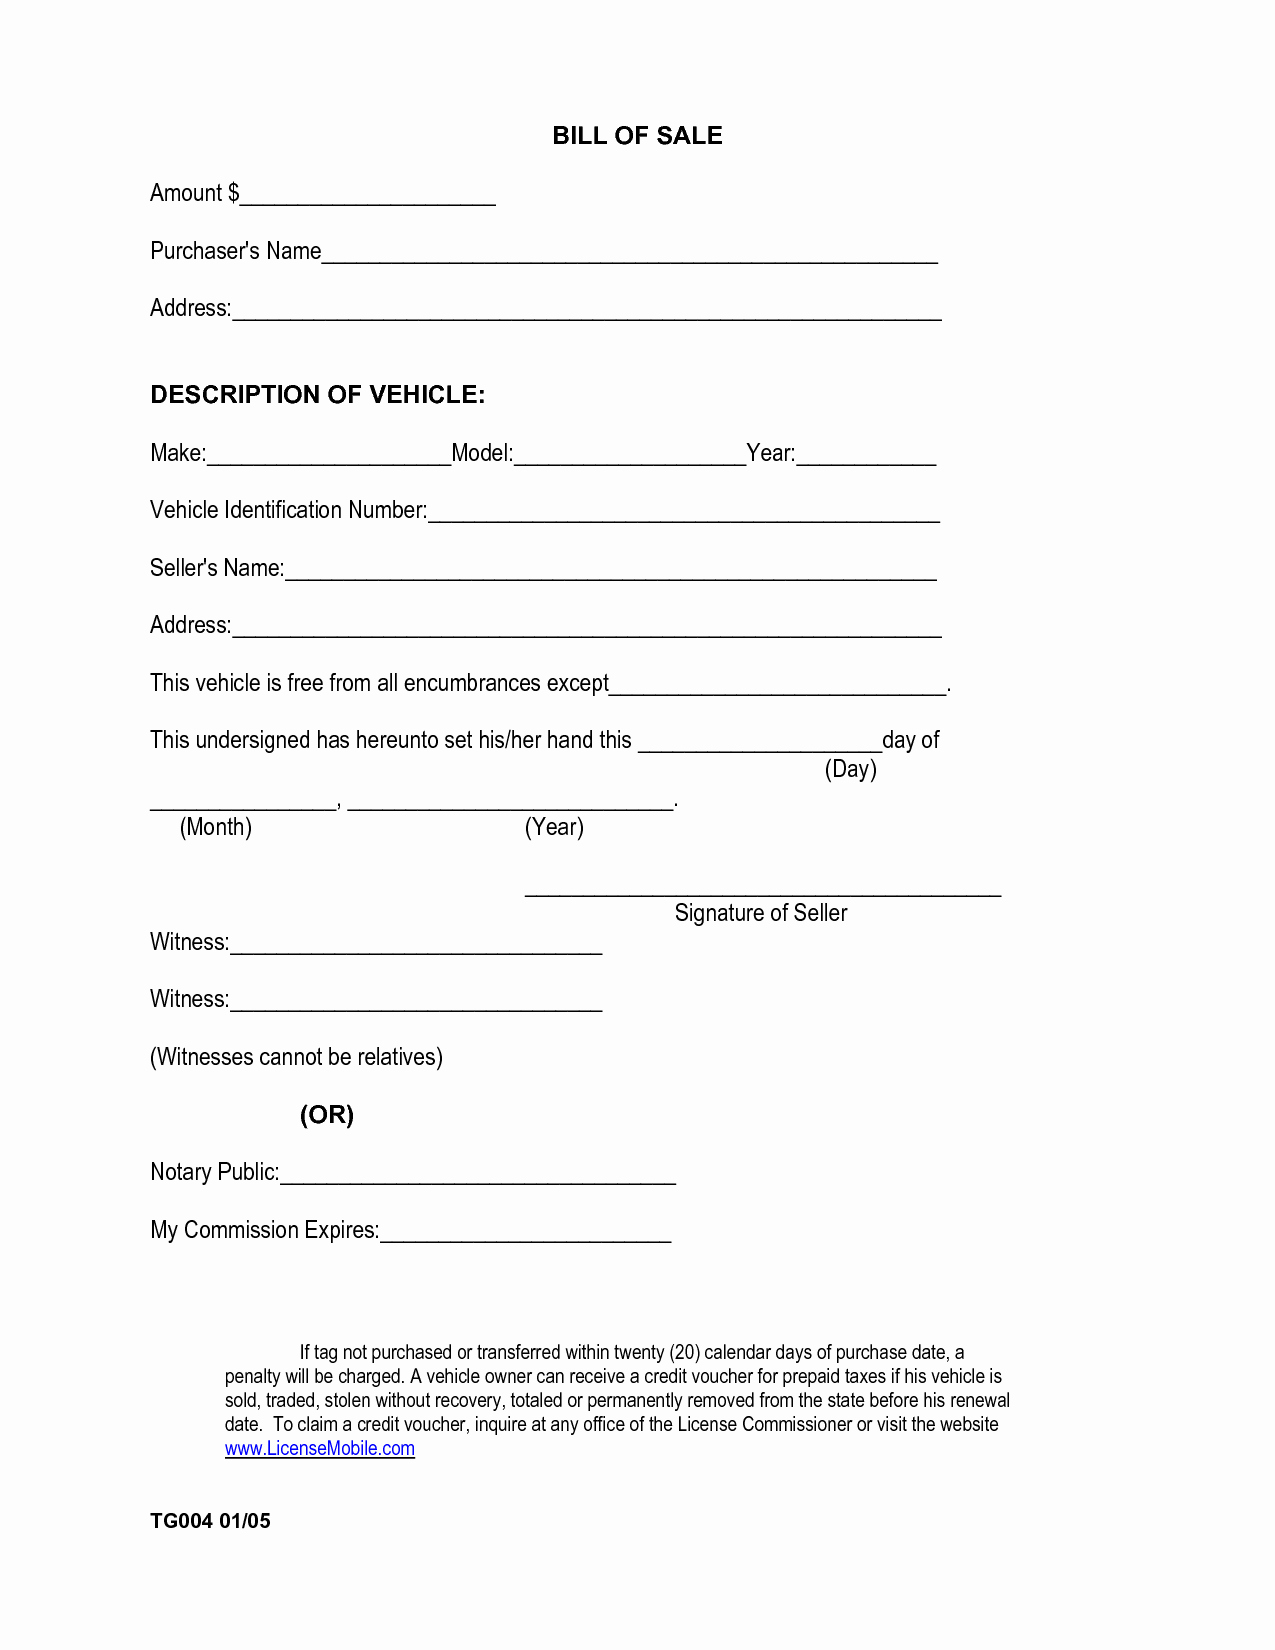 Free Downloadable Bill Of Sale Elegant Free Printable Car Bill Of Sale form Generic